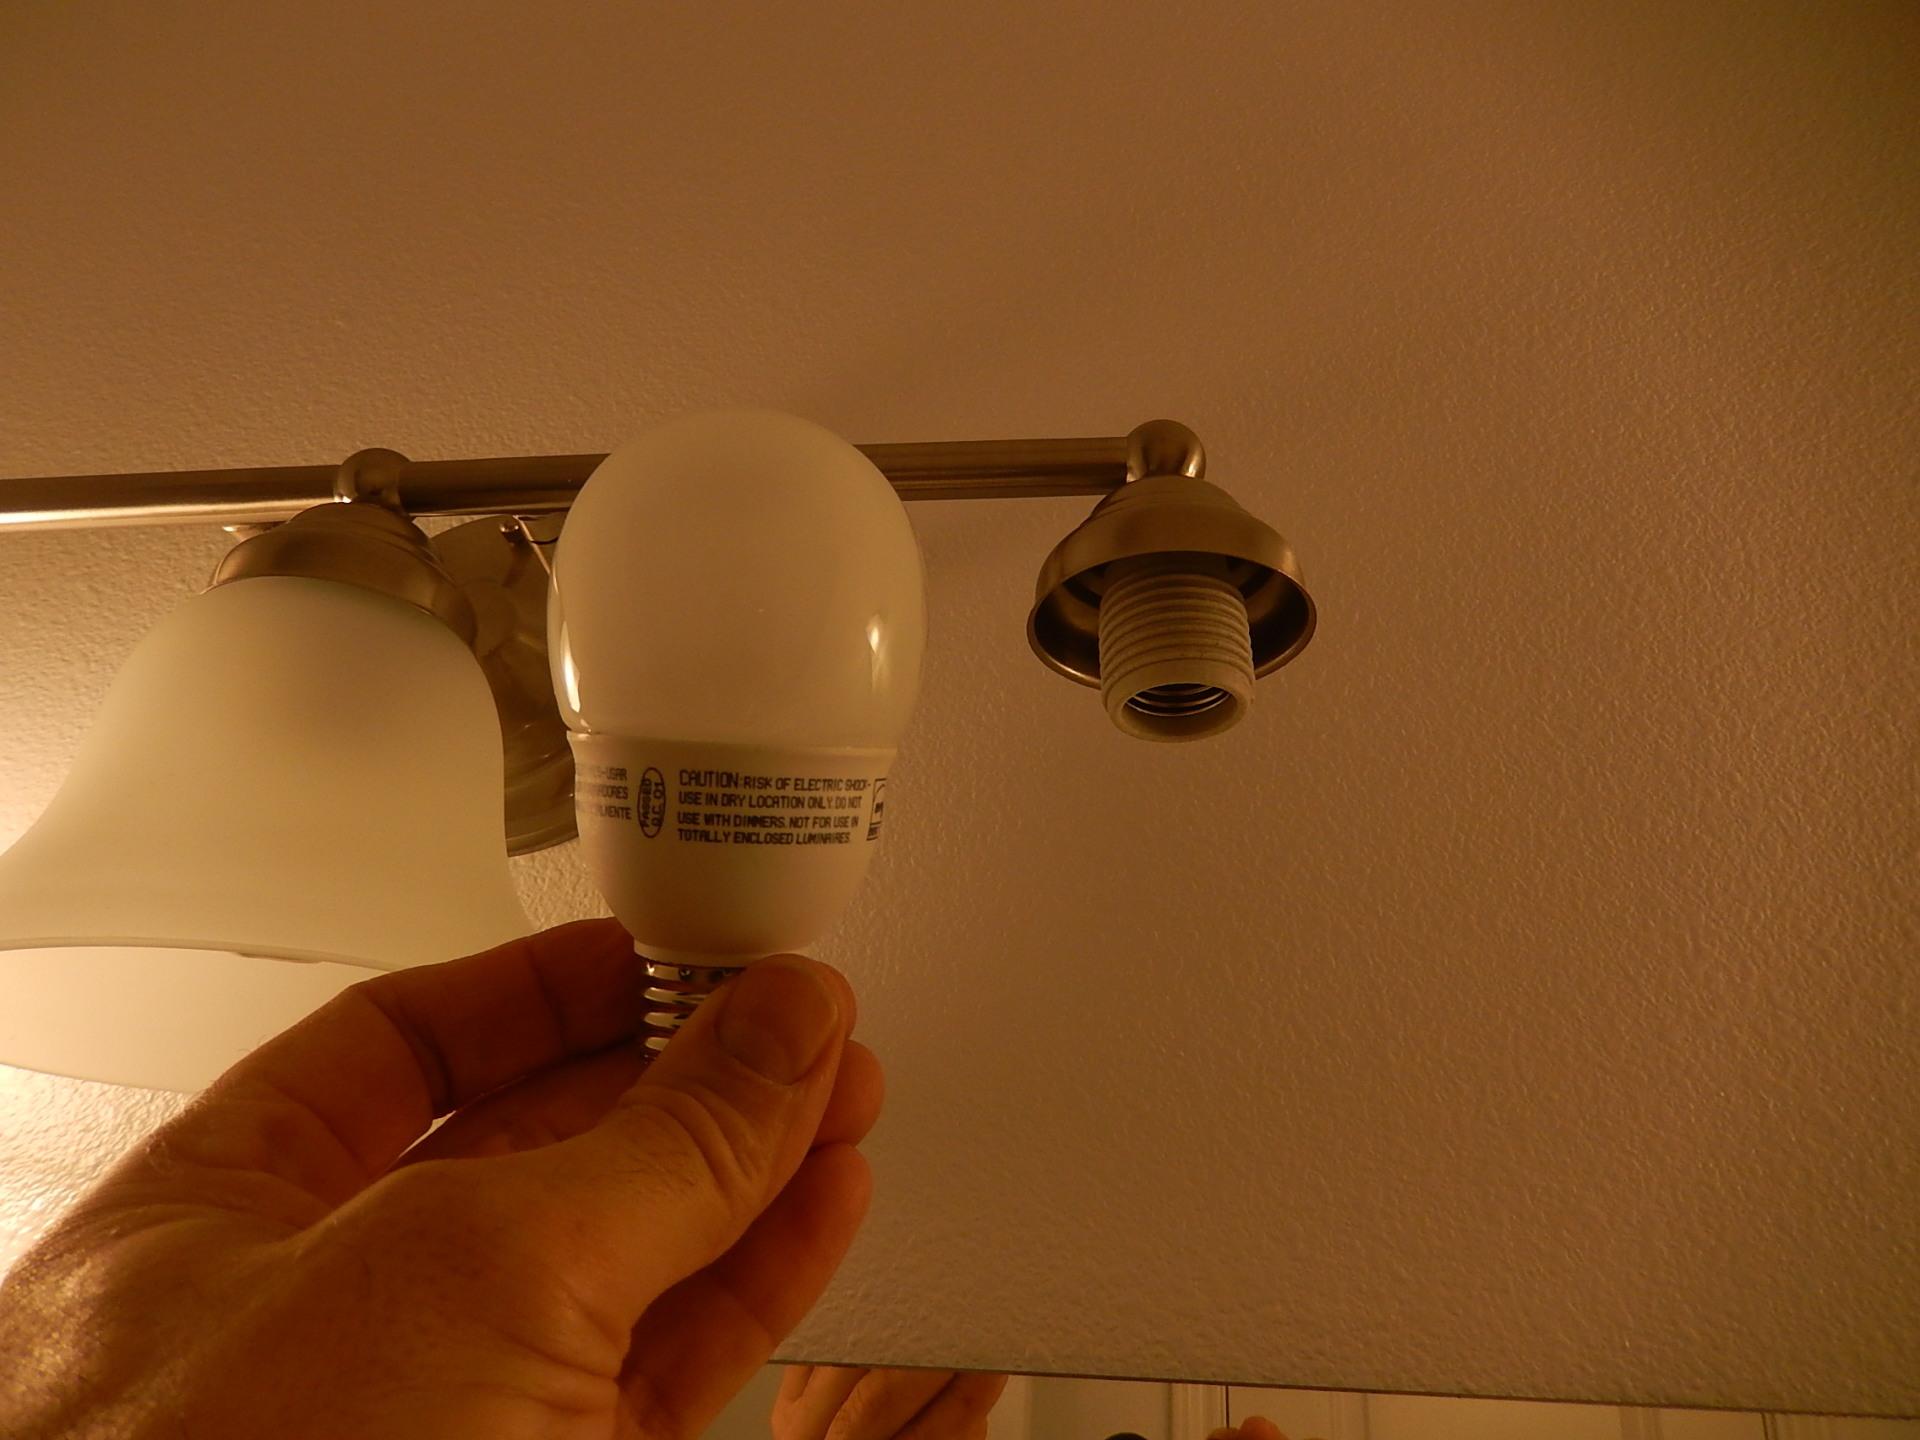 Light Bulbs - Energy Saving and Replaccments